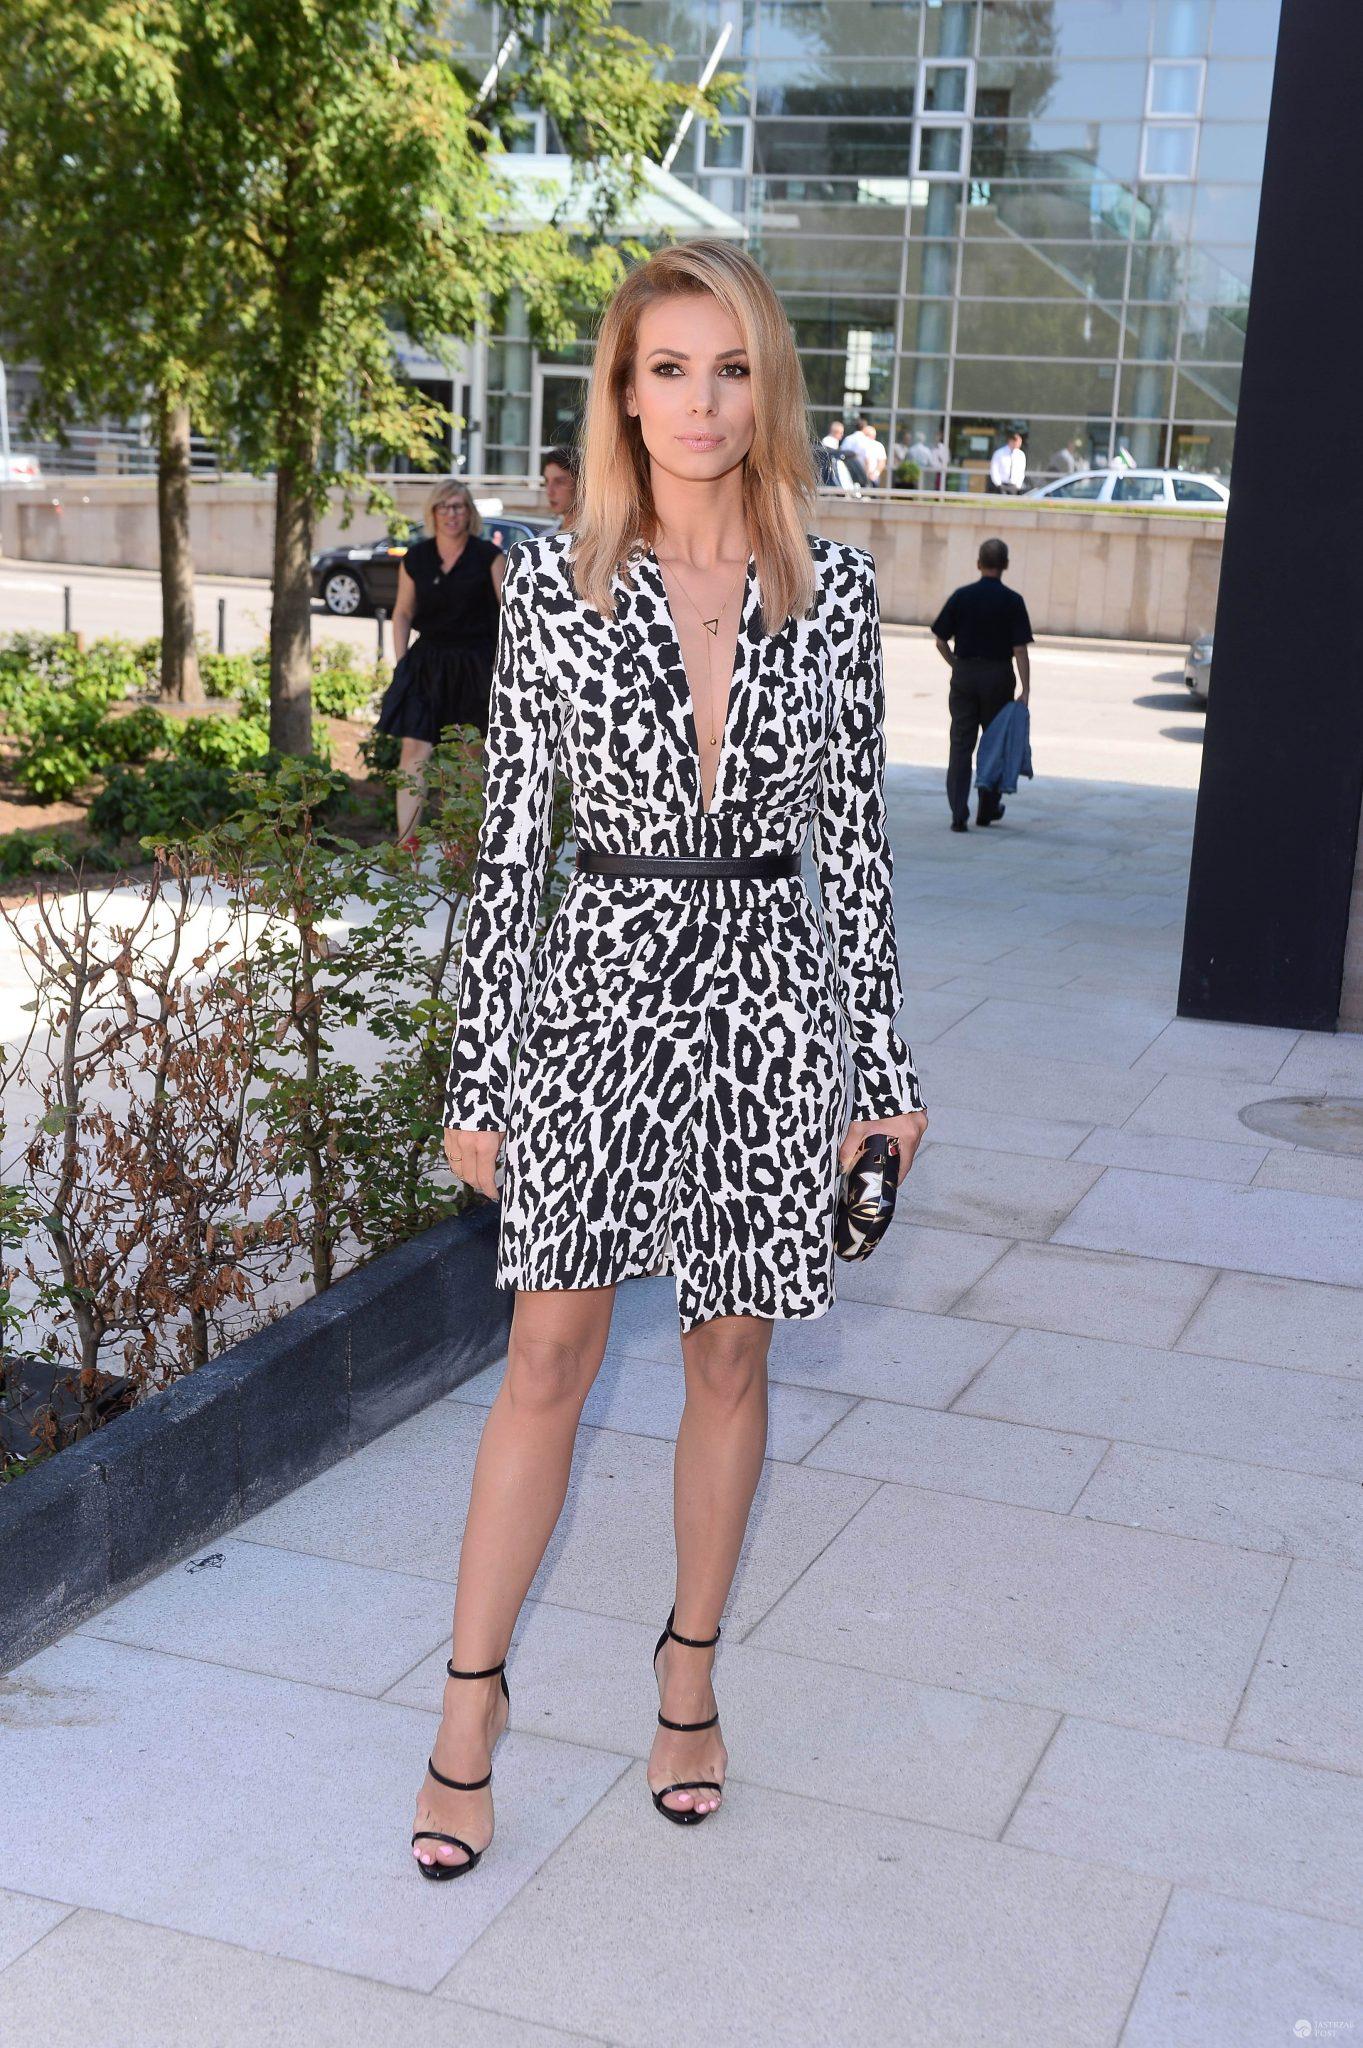 Izabela Janachowska - ramówka TVN Style jesień 2016